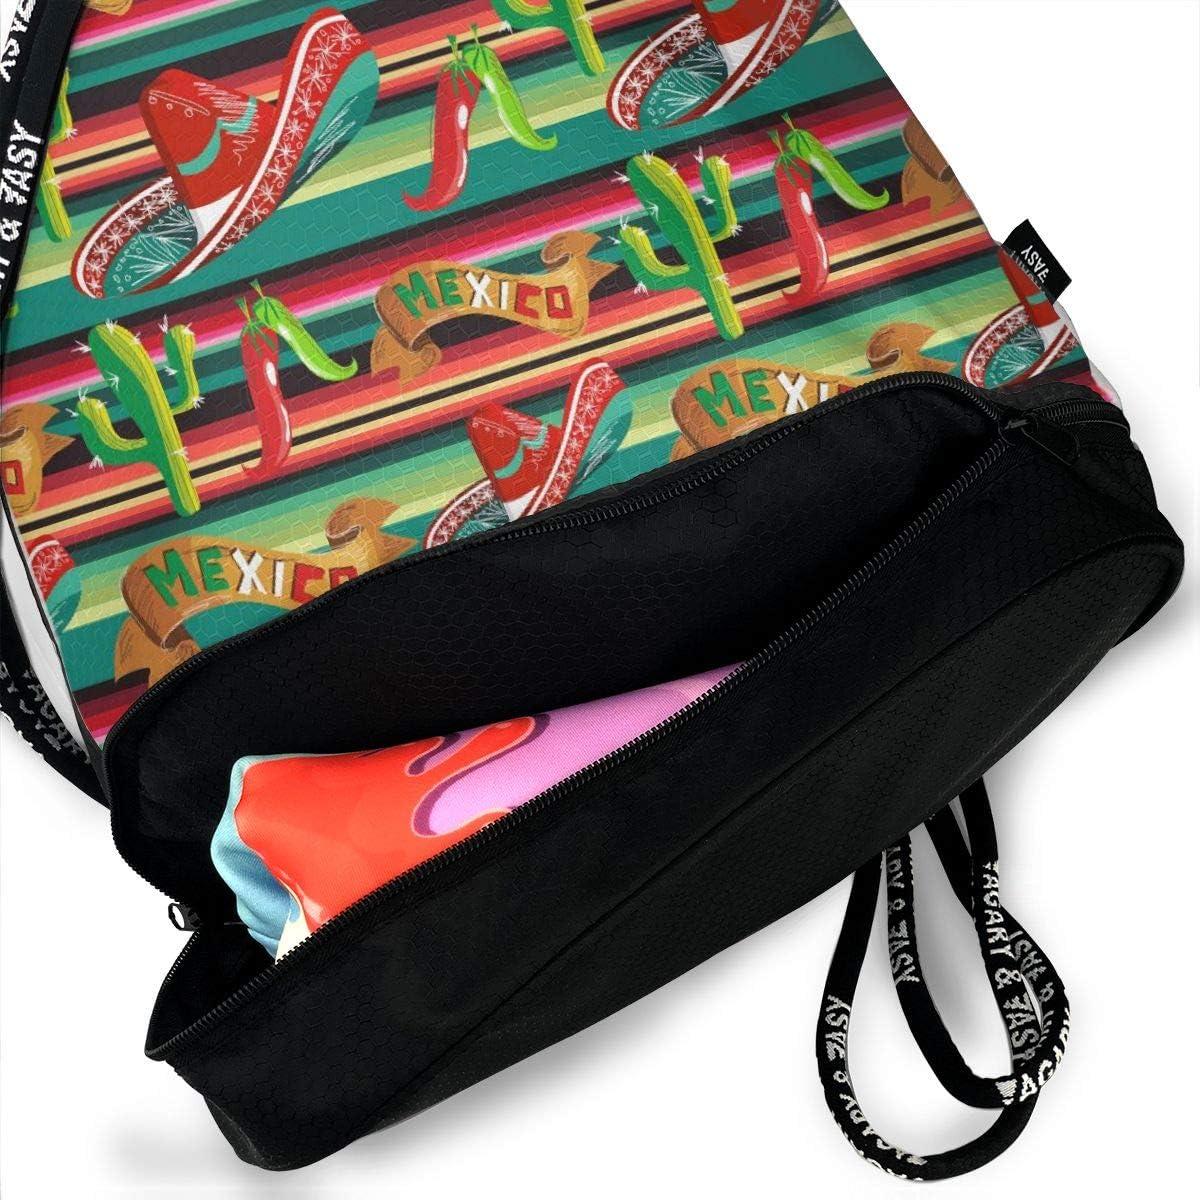 Lightweight Waterproof Large Storage Drawstring Bag For Men /& Women Mexico FIgure Cinch Backpack Sackpack Tote Sack